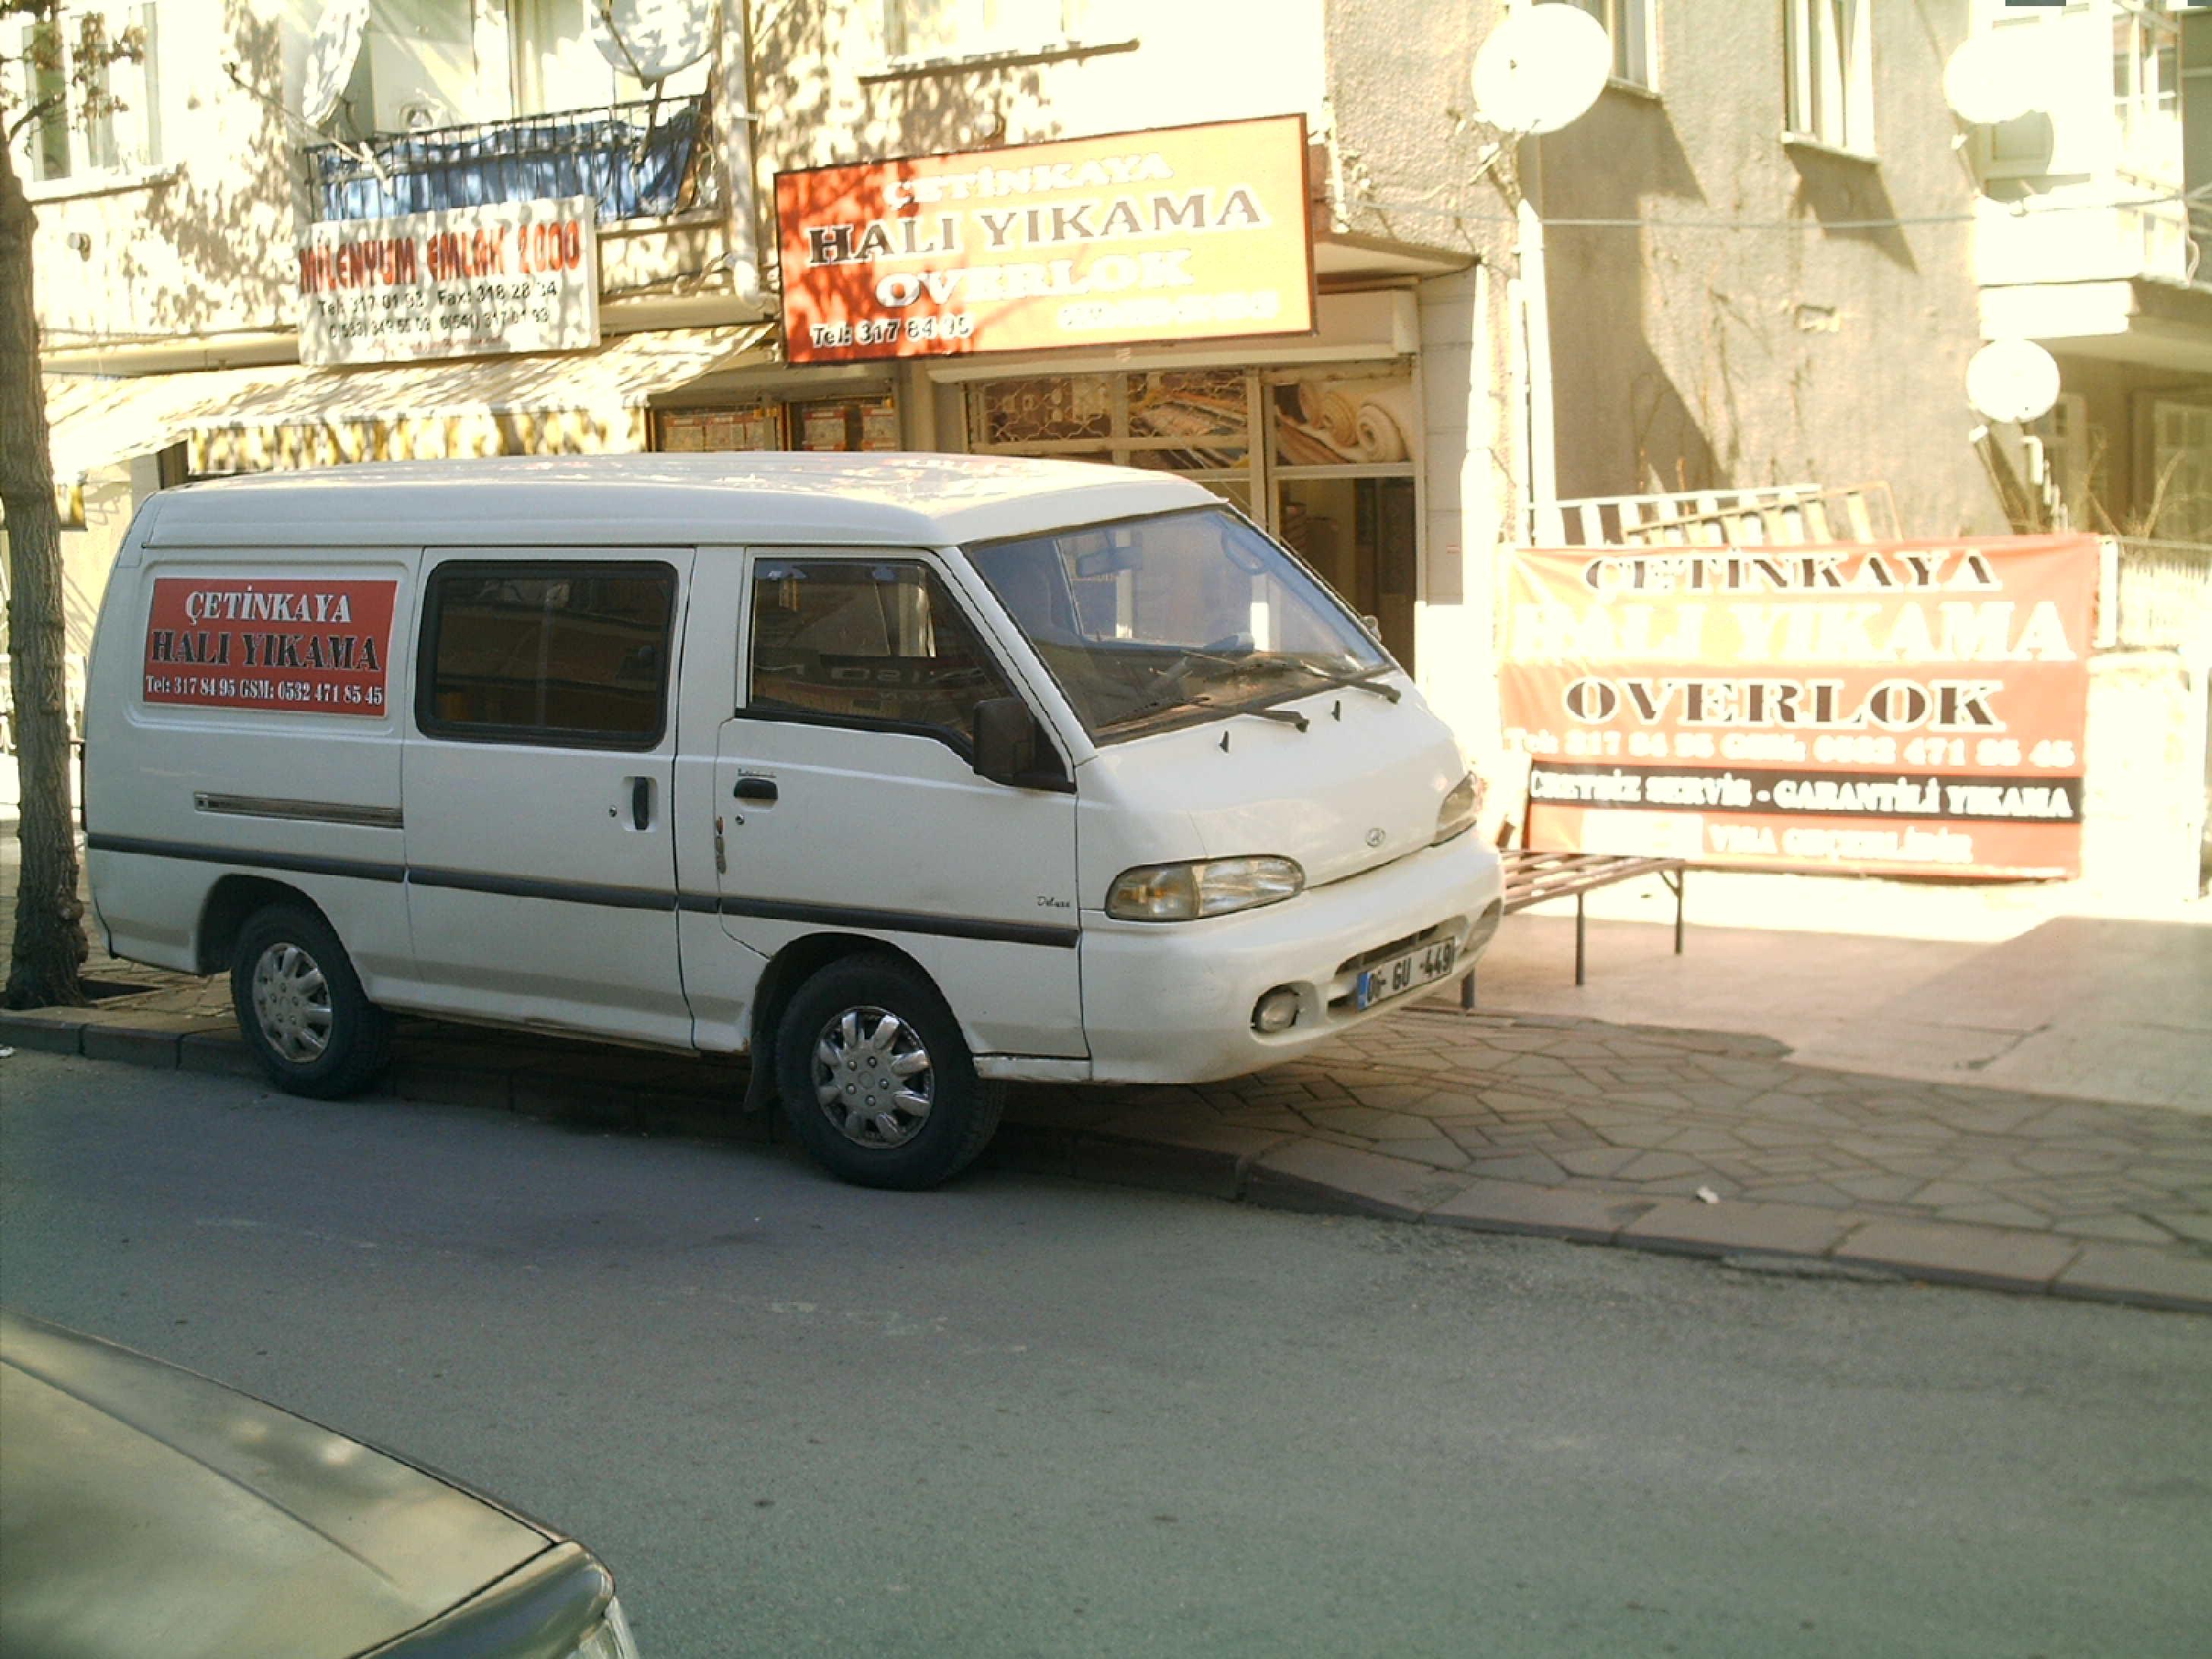 kalaba_hali_yikama_servis